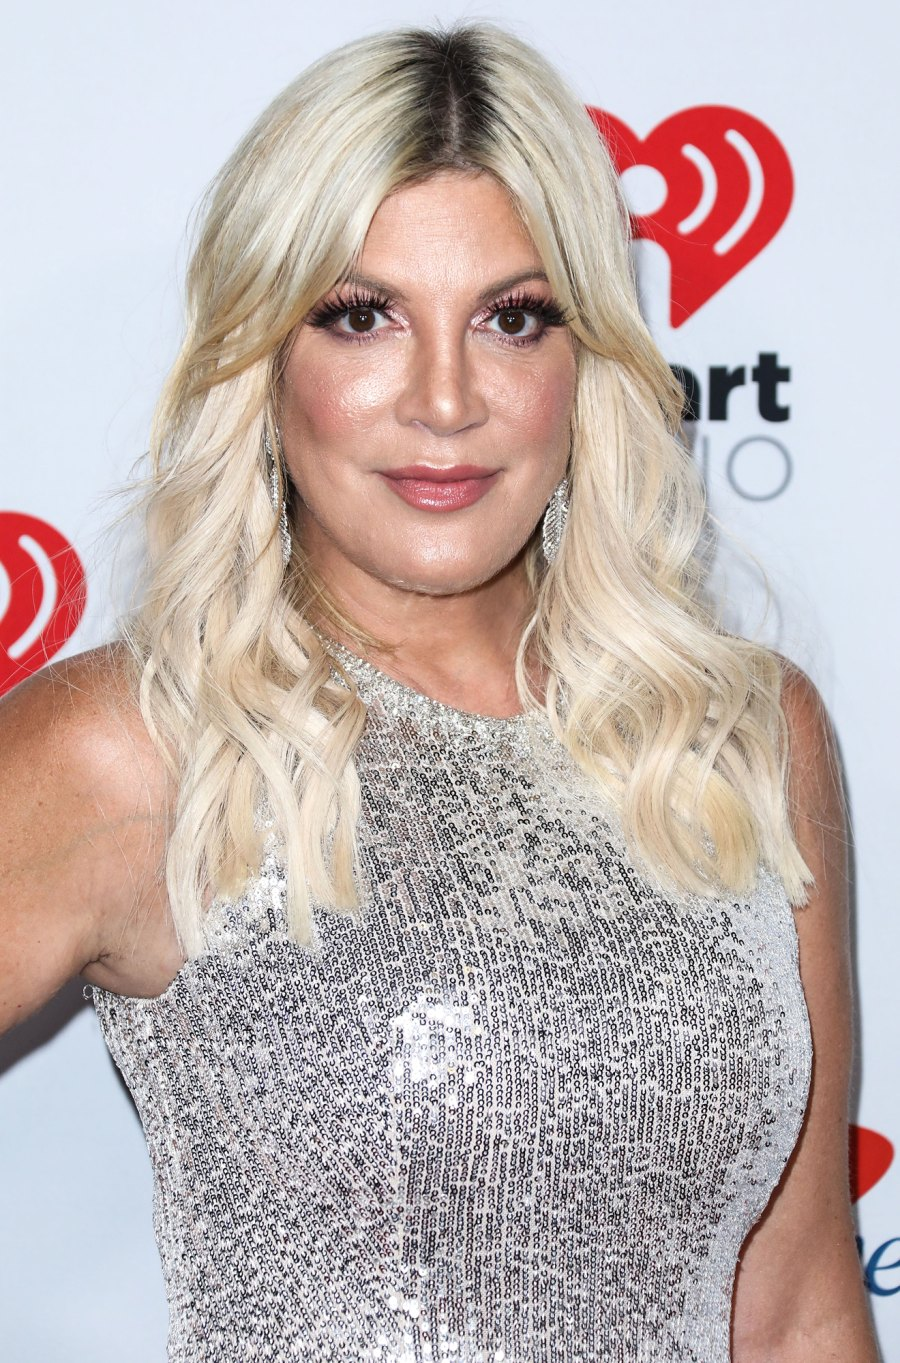 Tori Spelling 90210 Stars Deny Jessica Alba Eye Contact Claim